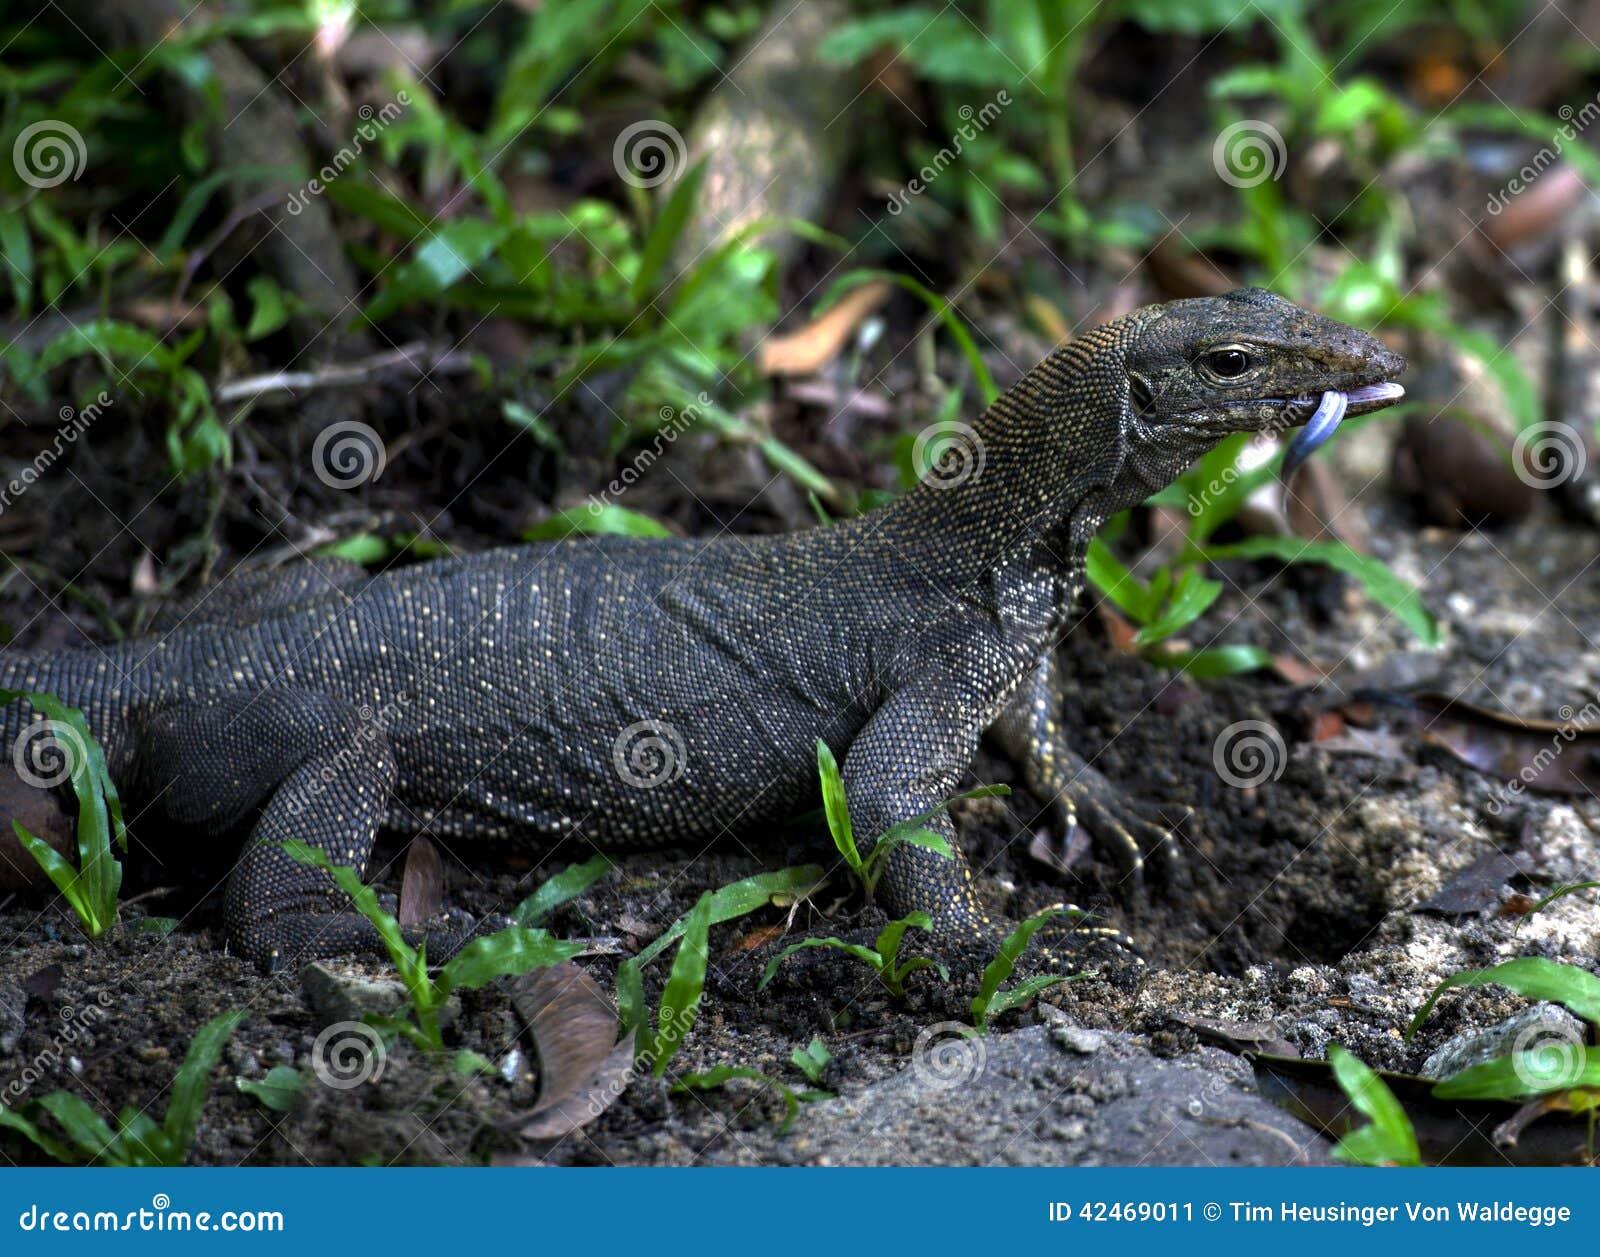 Asiatischer Wassermonitor (Varanus salvator)